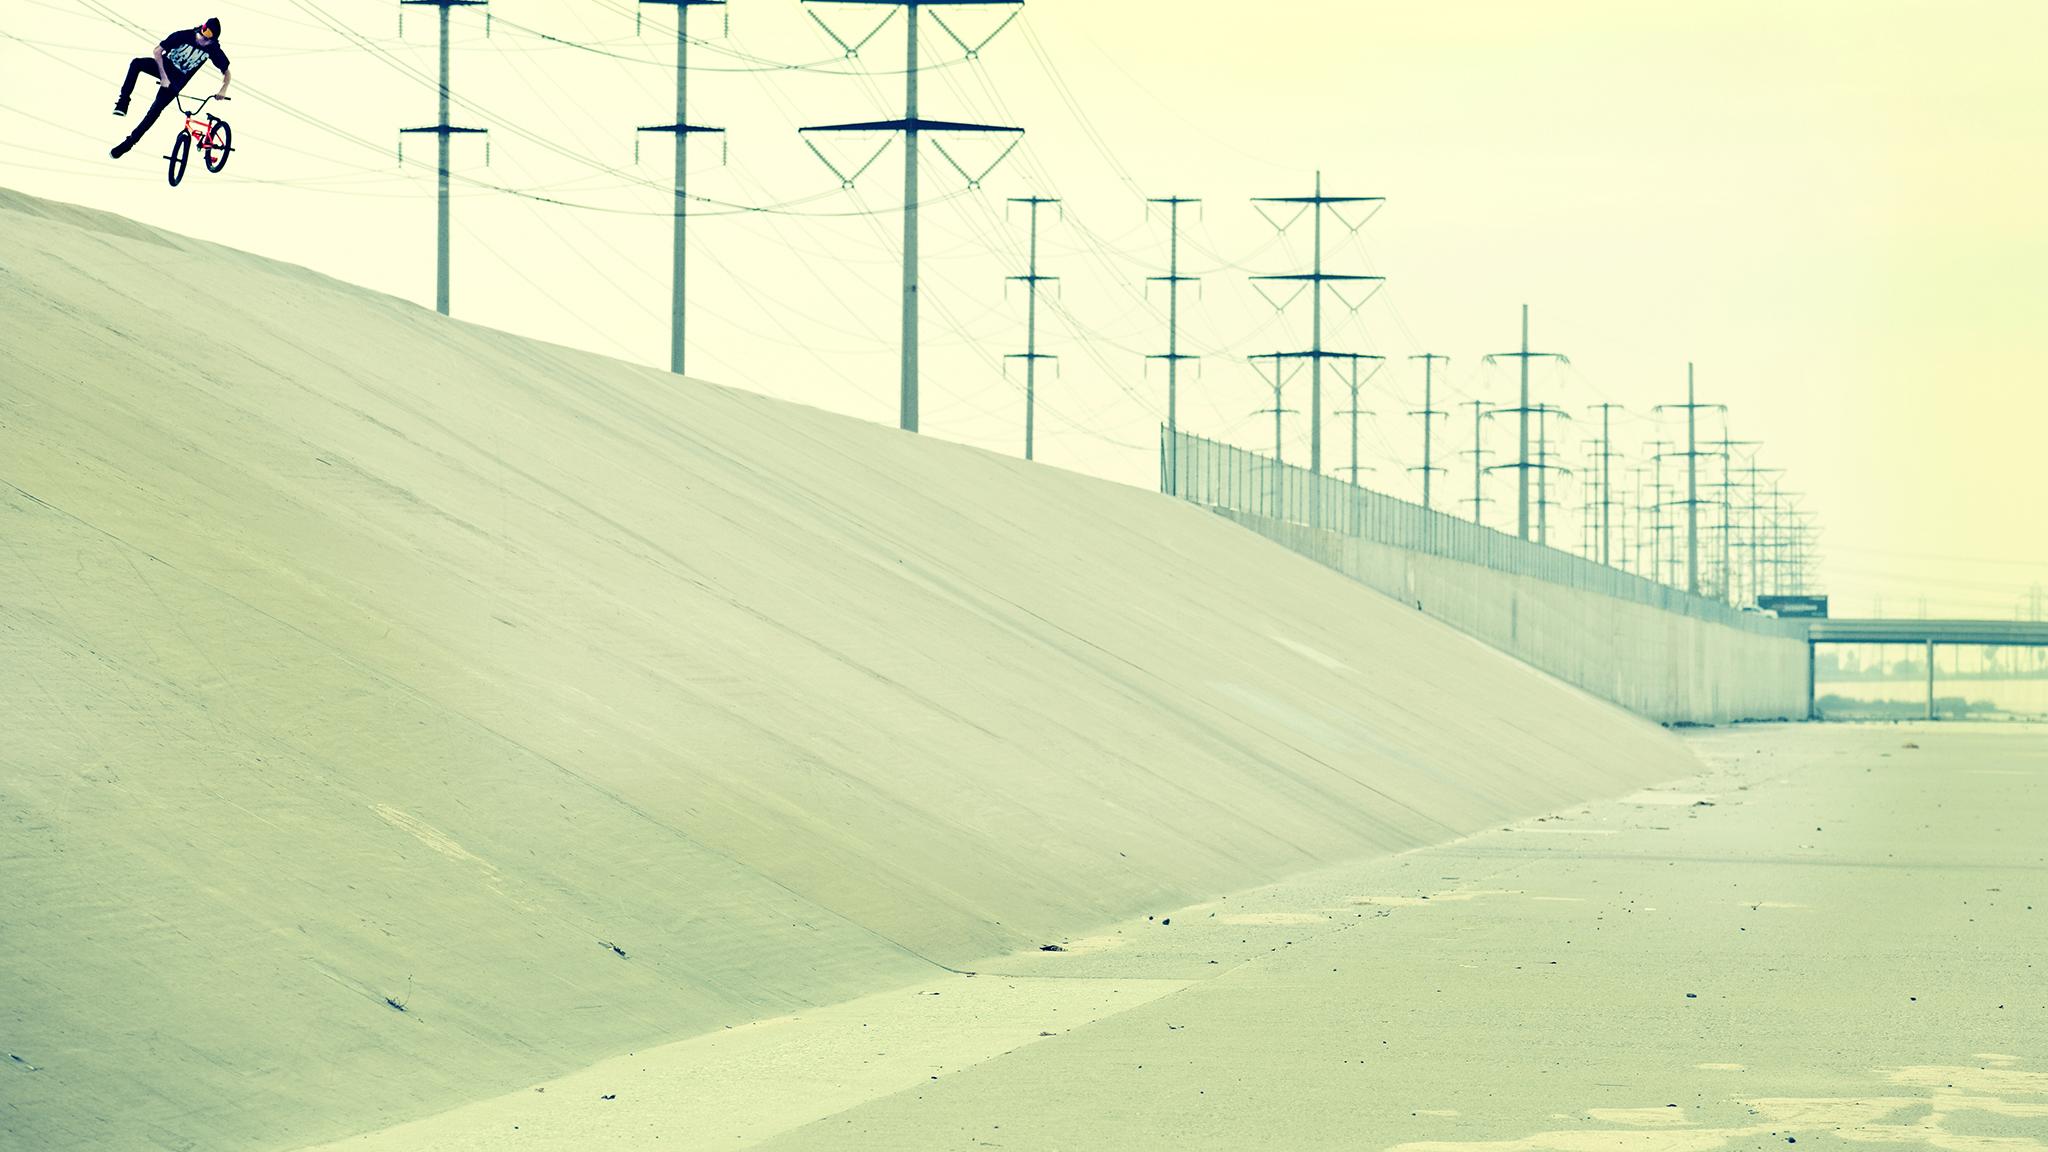 Tailwhip, California